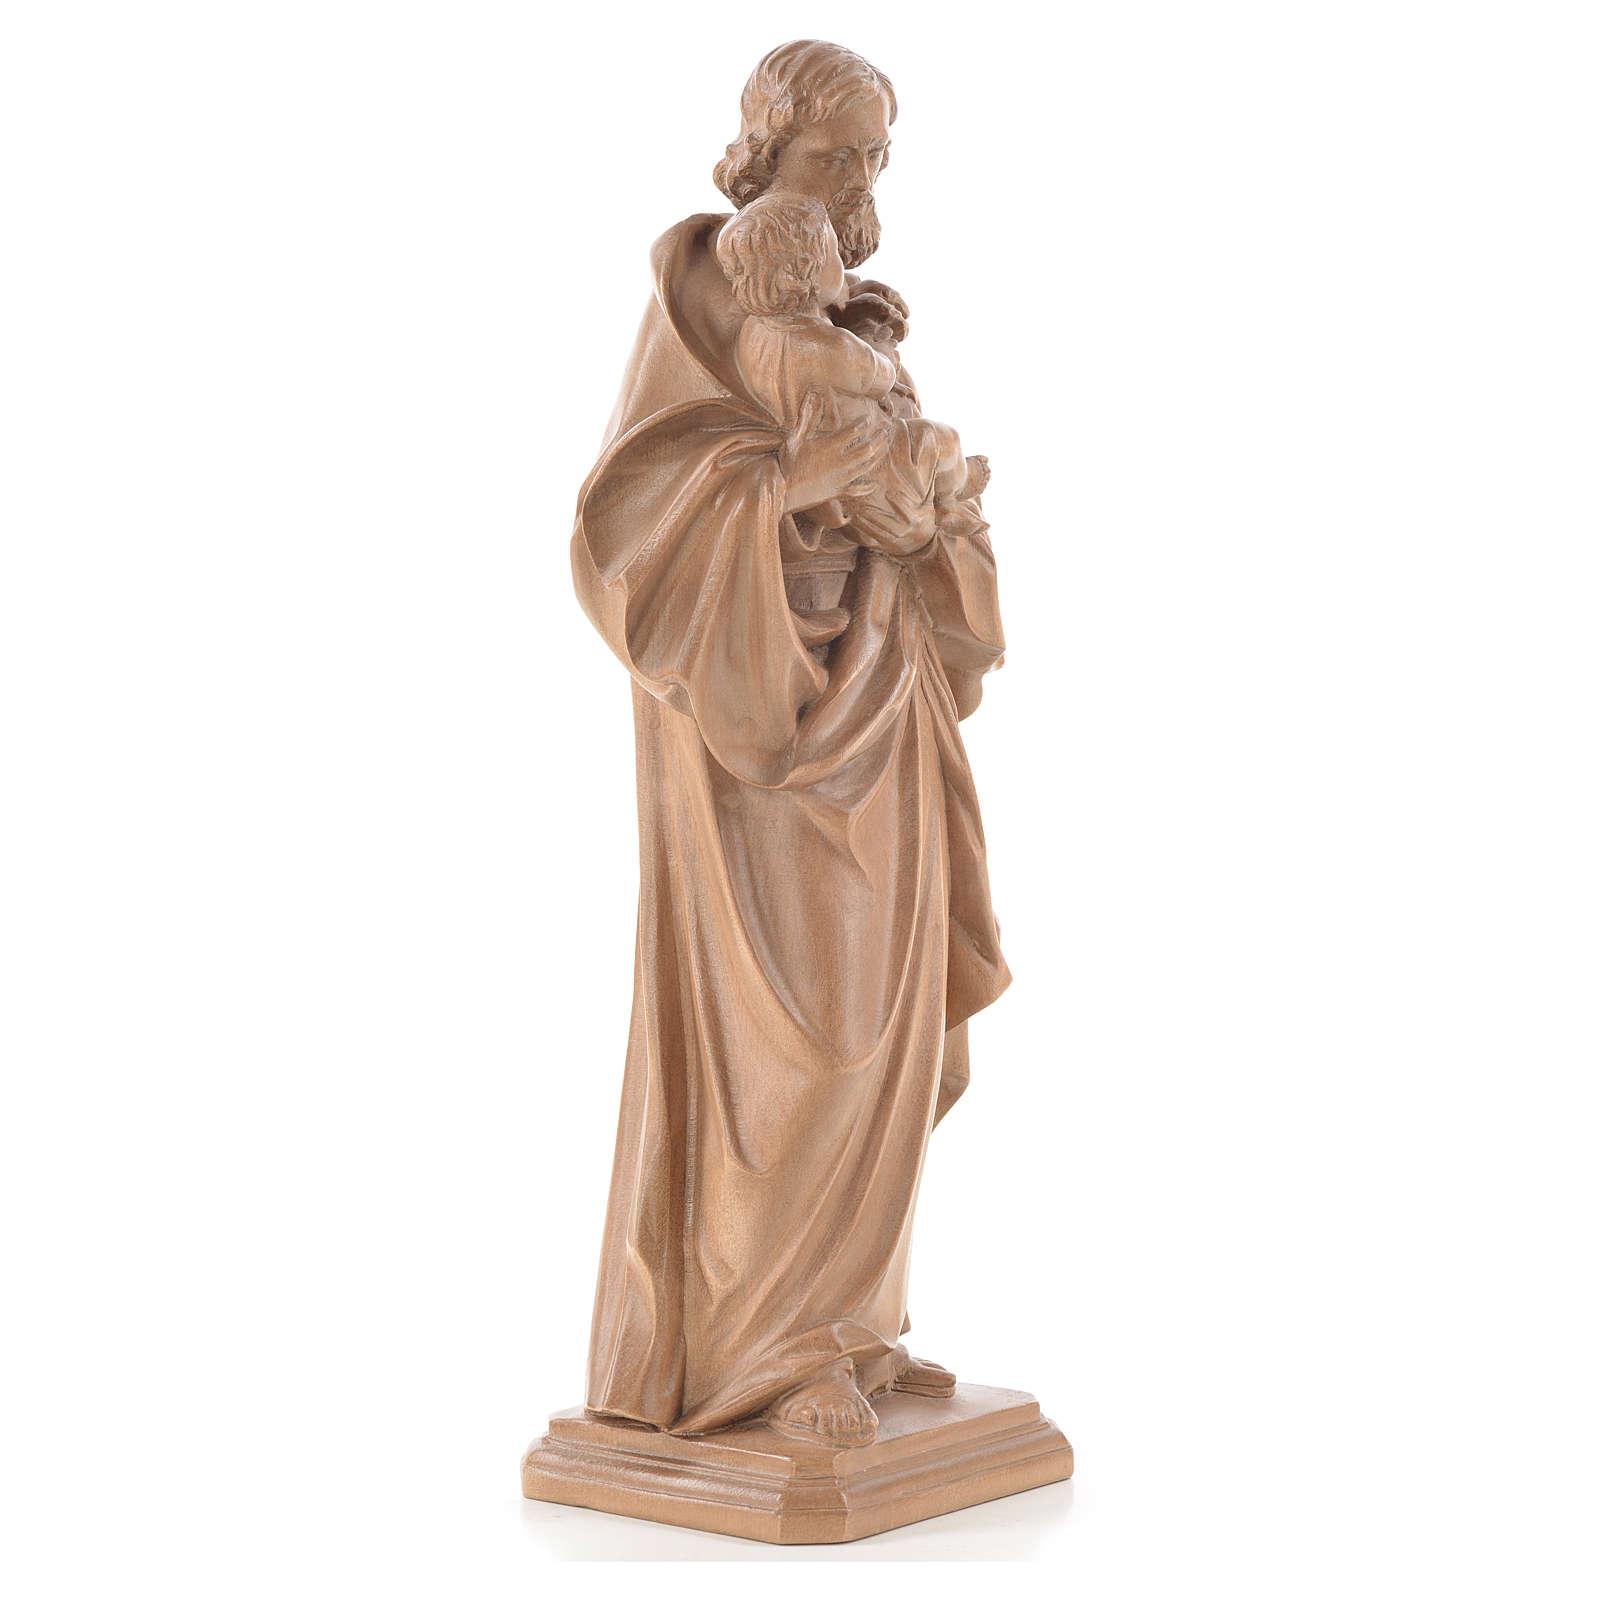 Guido Reni's Saint Joseph in patinated Valgardena wood 4